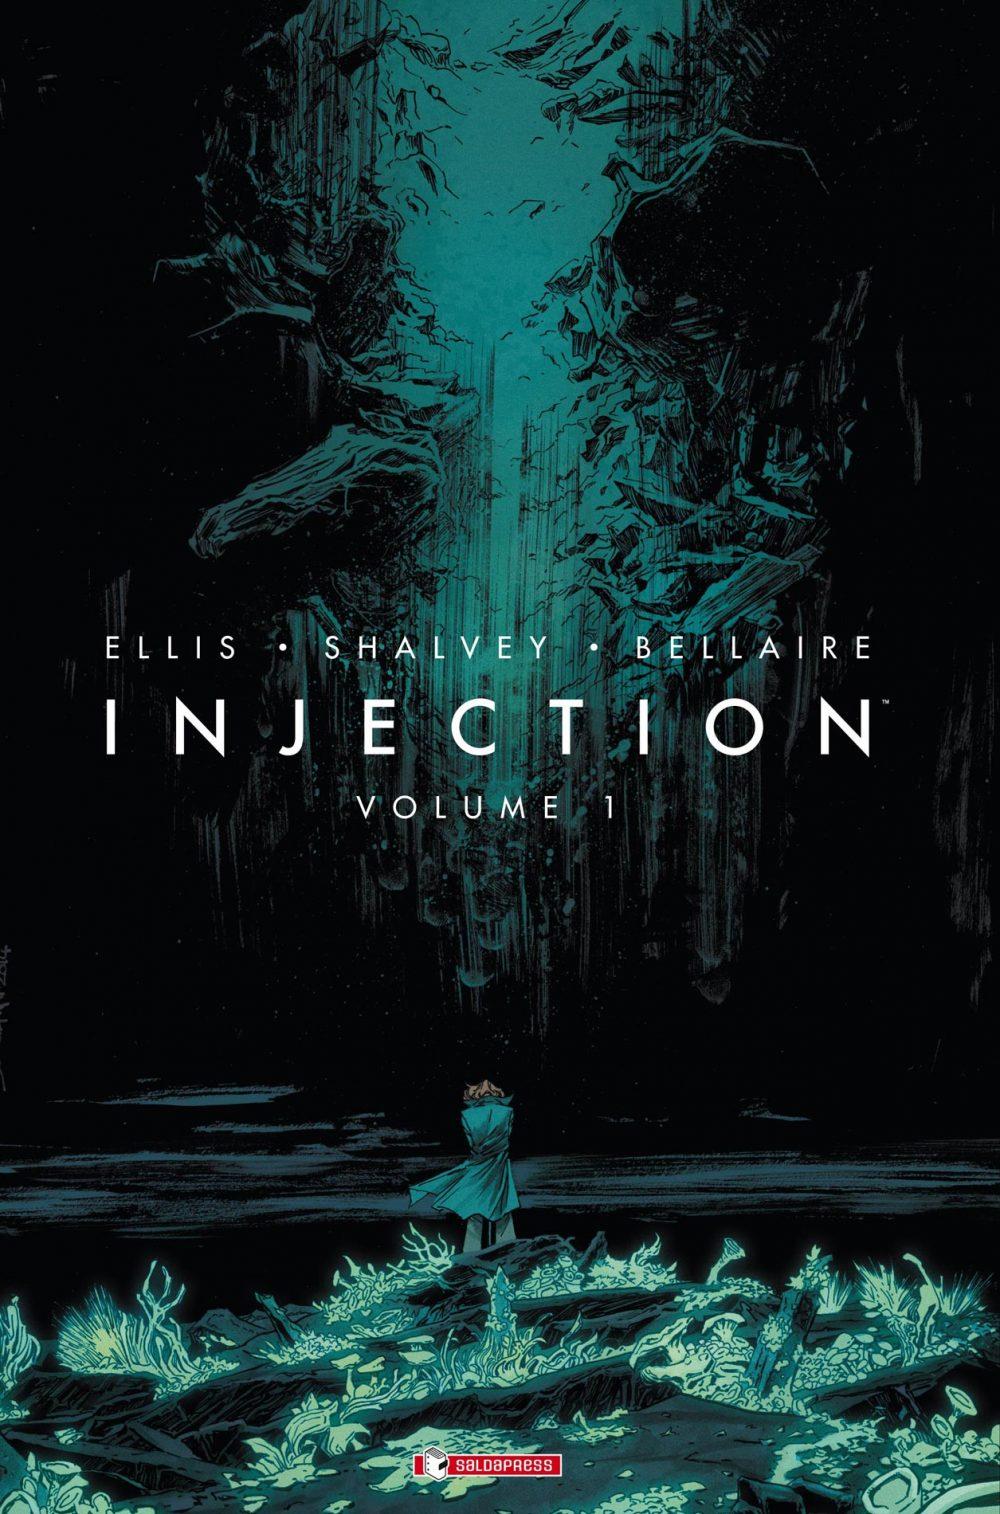 Injection vol. 1, copertina di Declan Shalvey